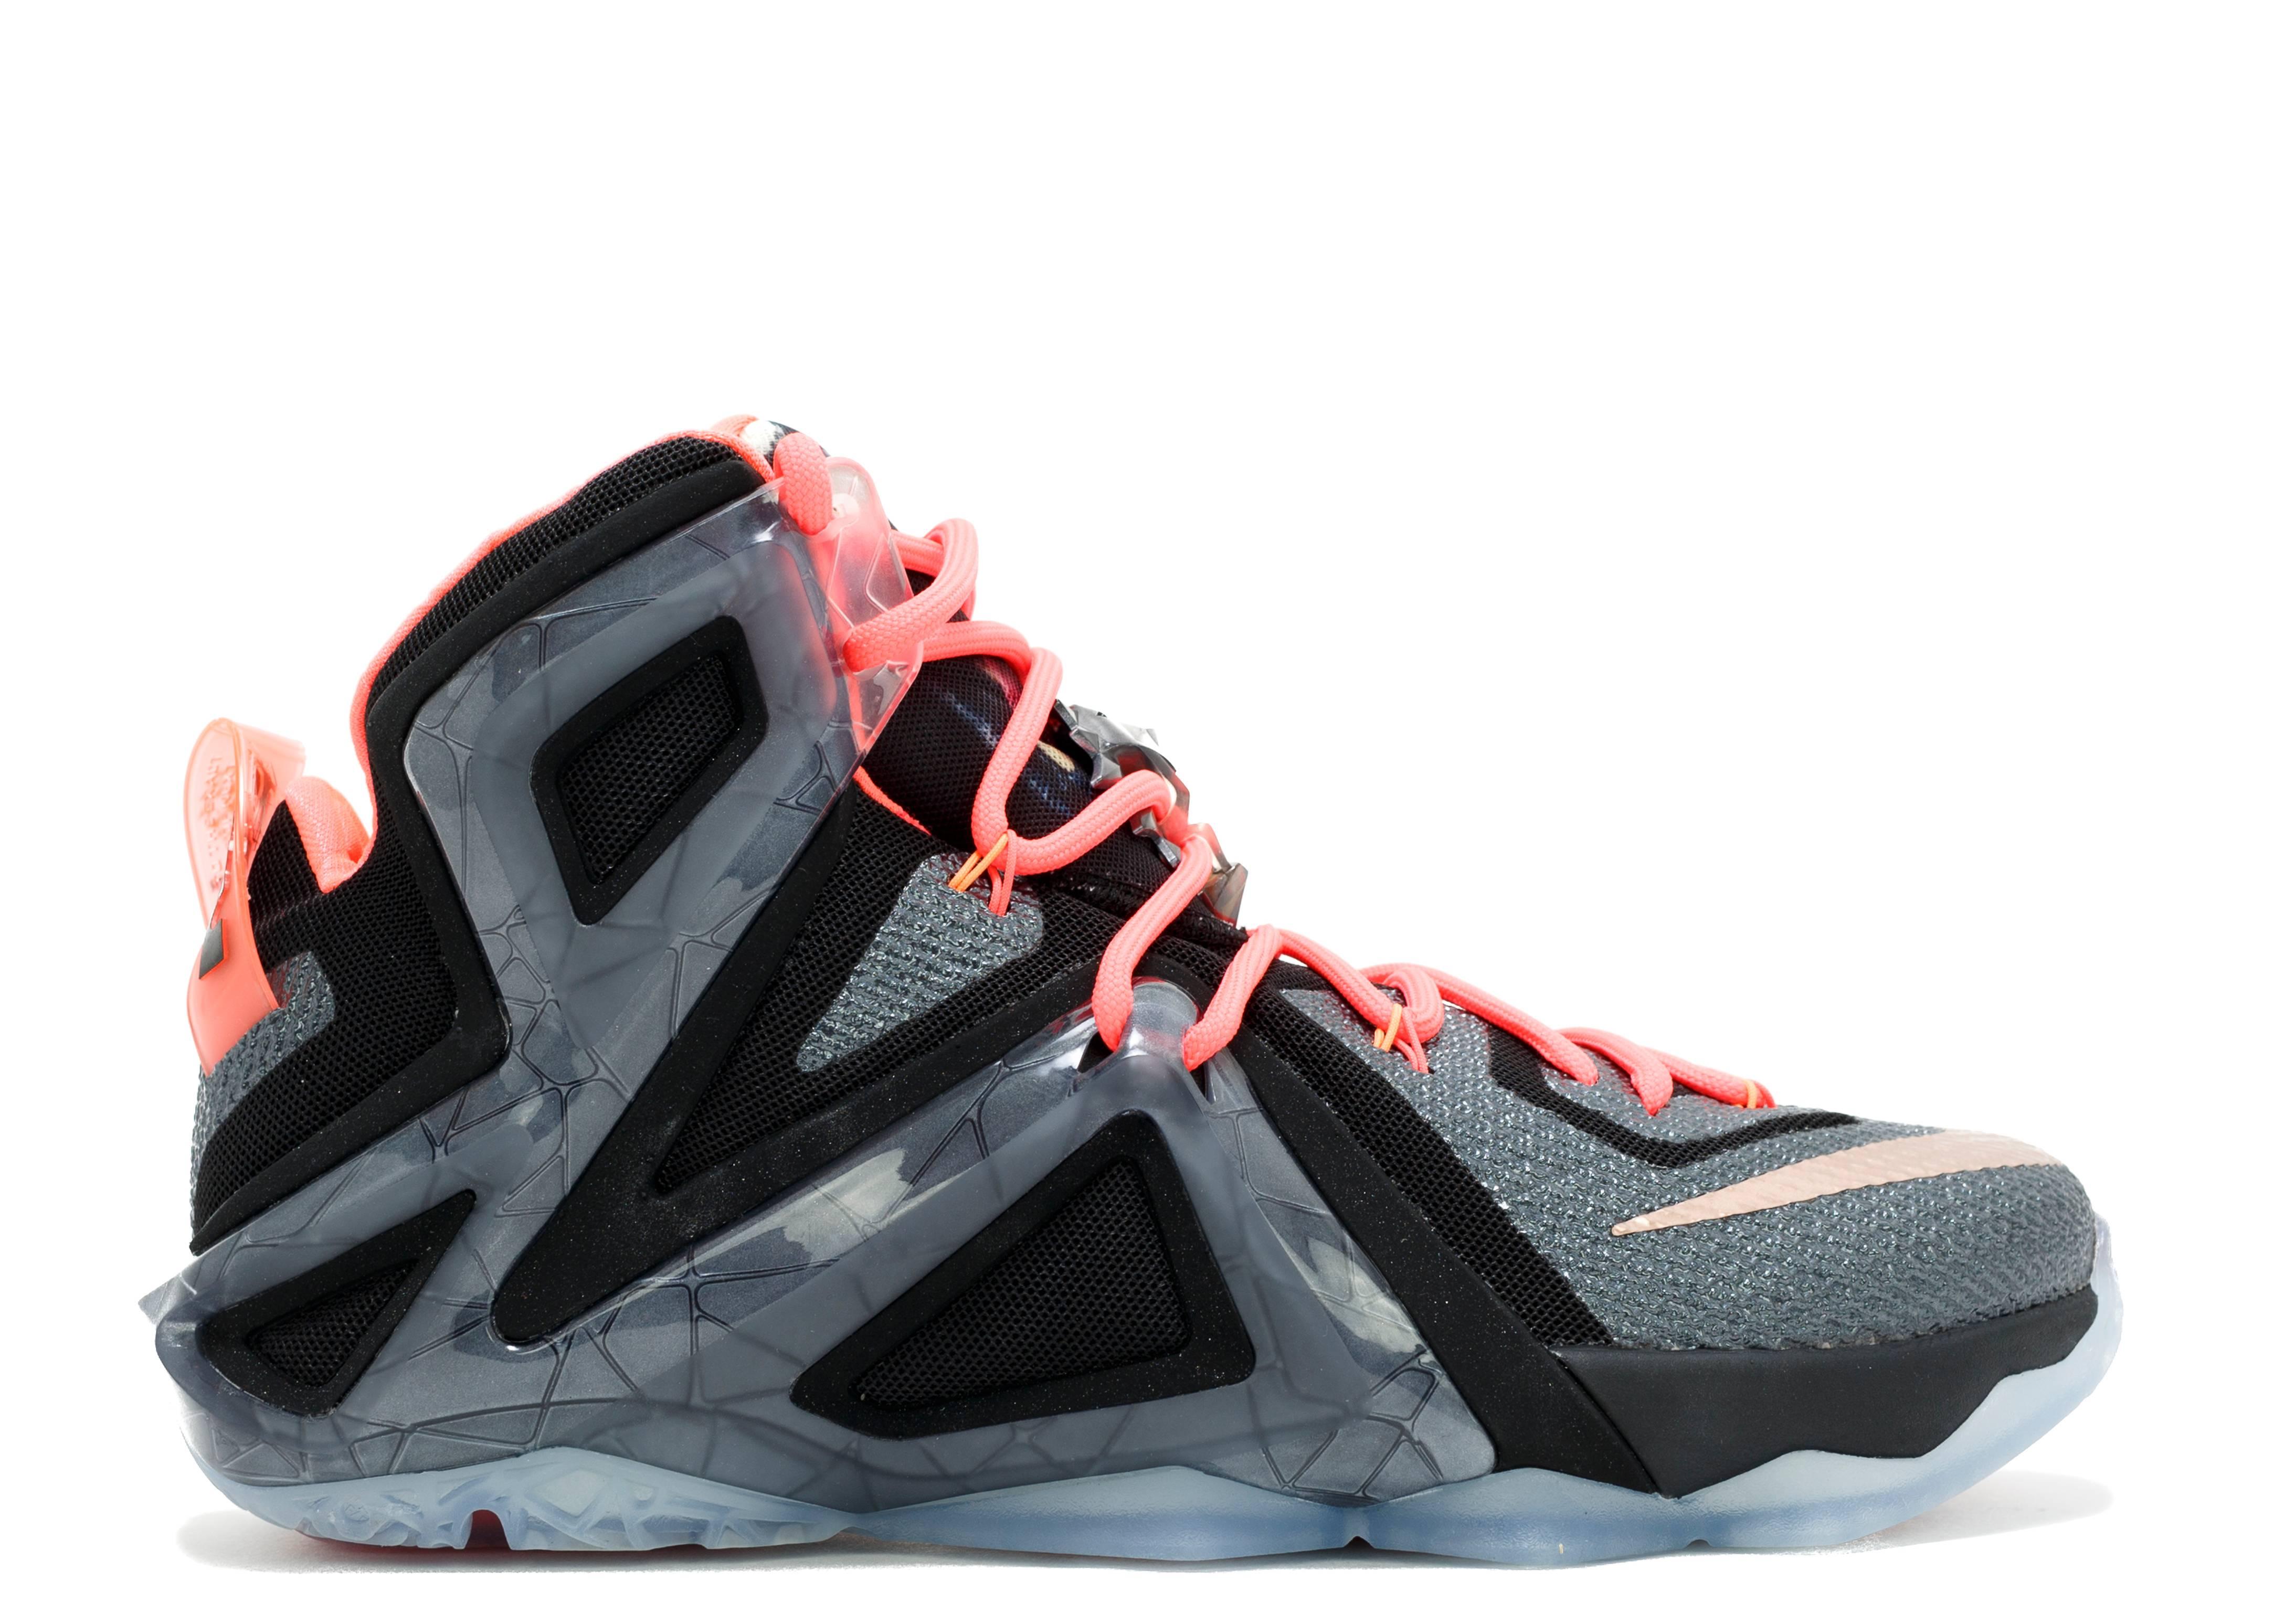 9b4246bf731f Lebron 12 Elite - Nike - 724559 091 - black mtlc rd brnz-white-ht lv ...